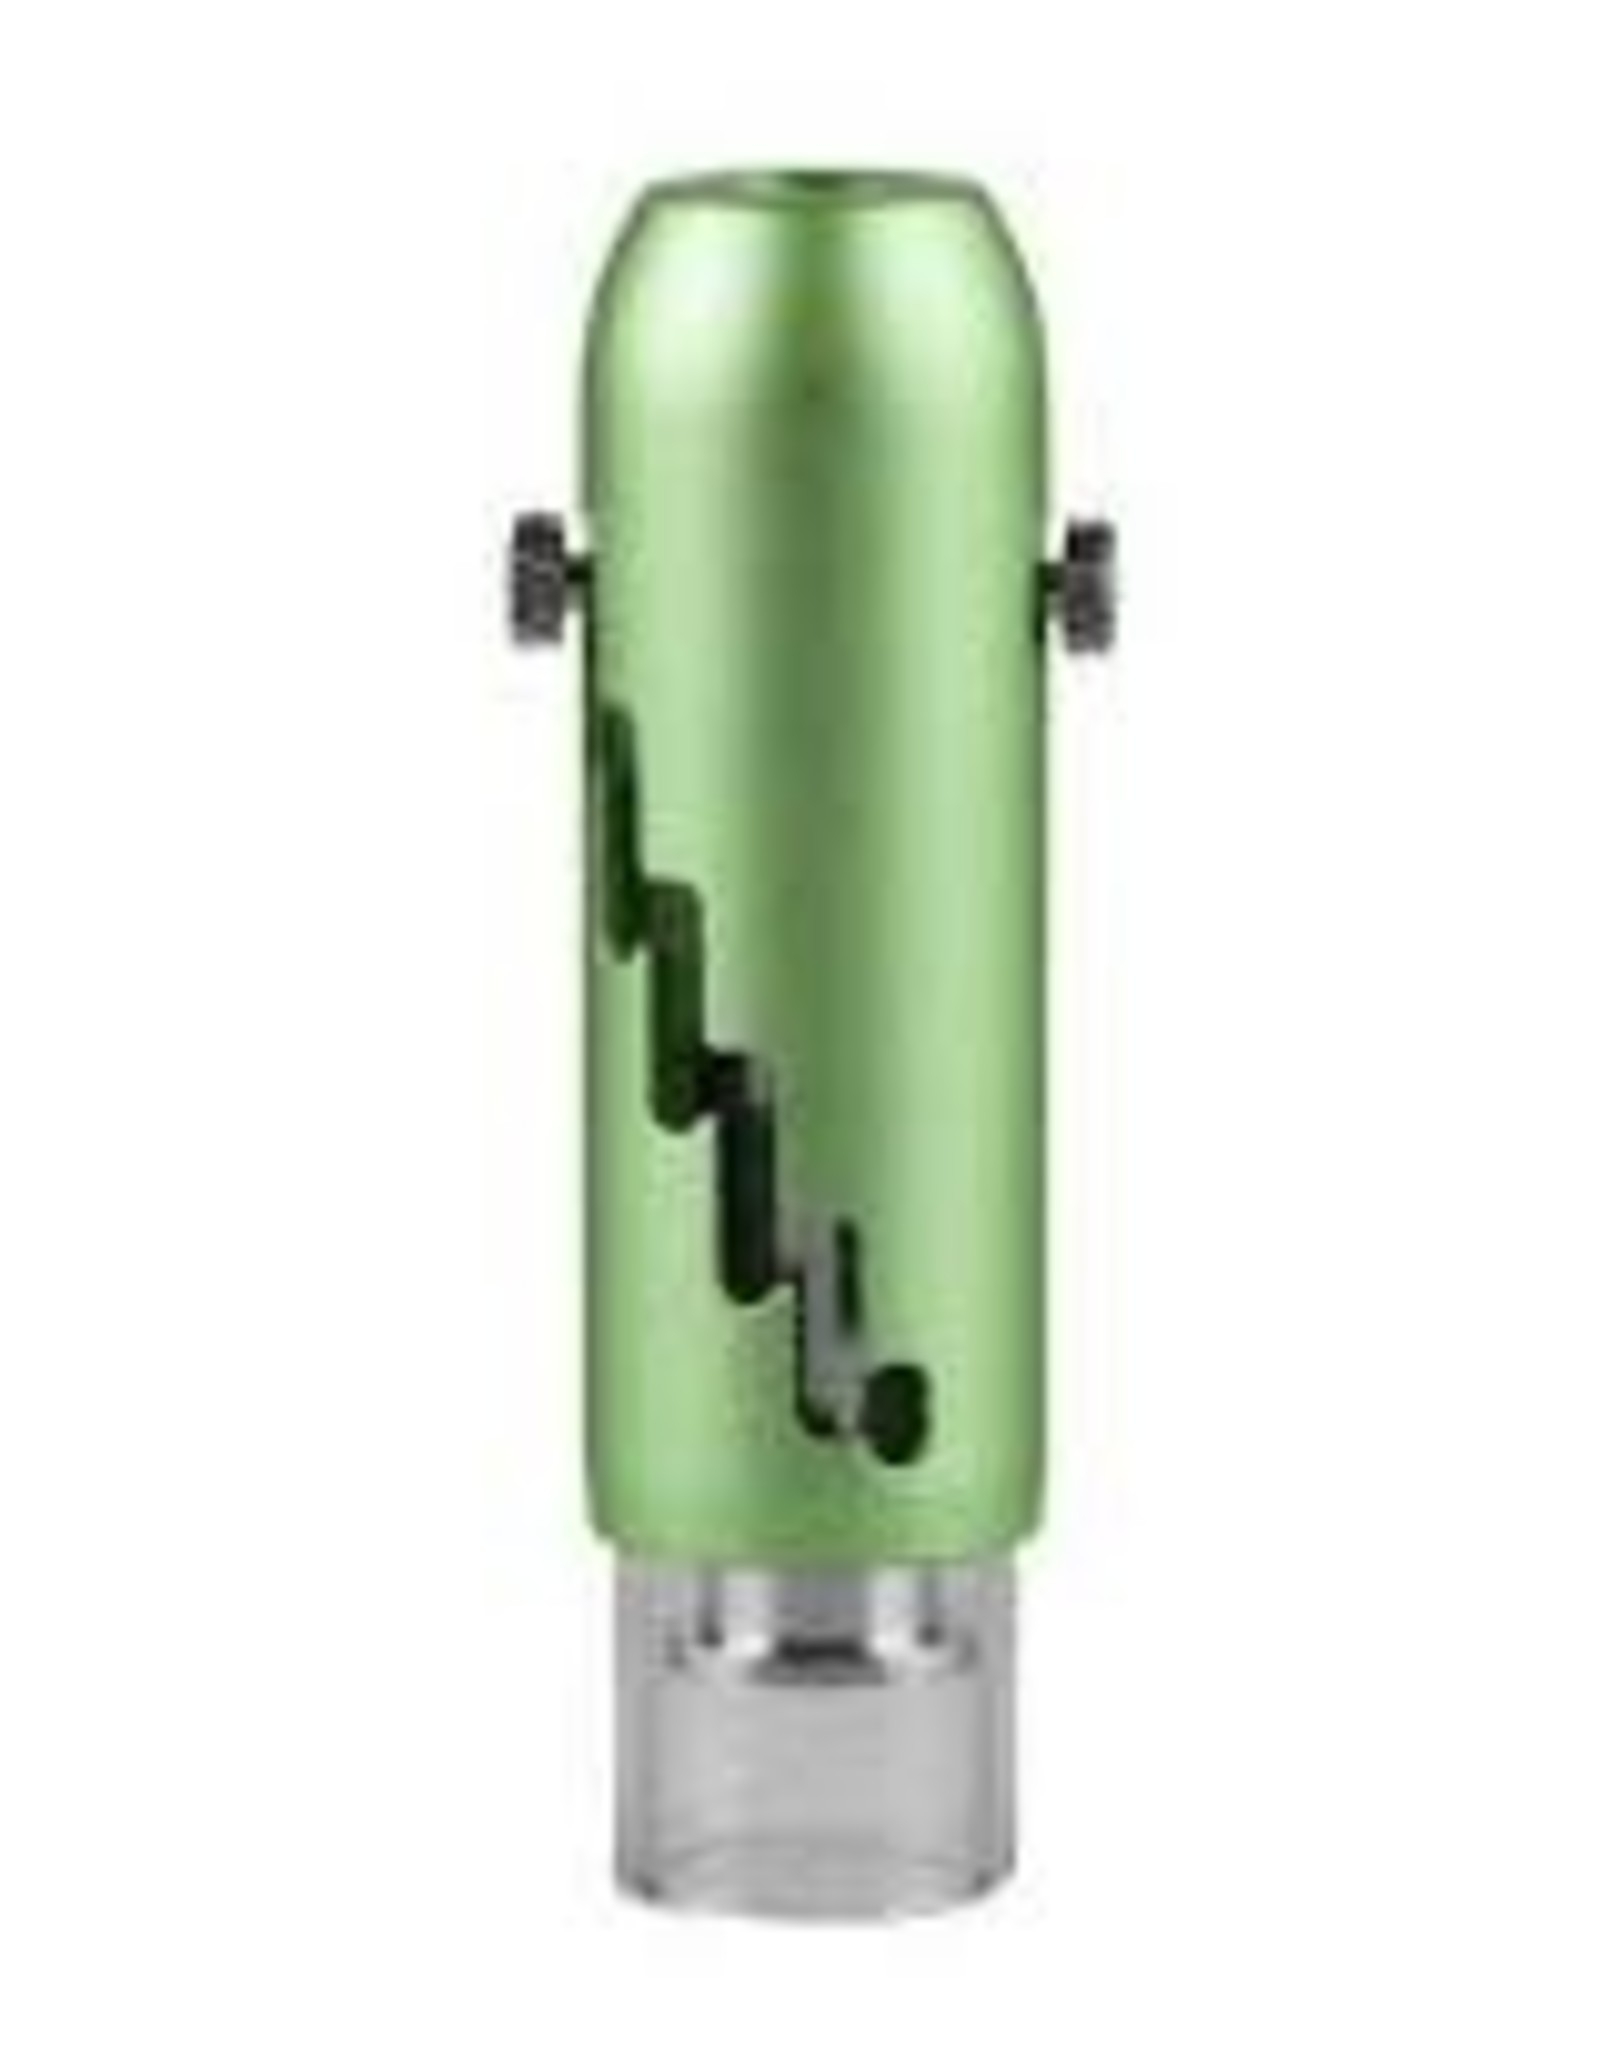 "Mj420 ass BlunGlt Best Grinder MJ420 Version 2  2.5""  Green"